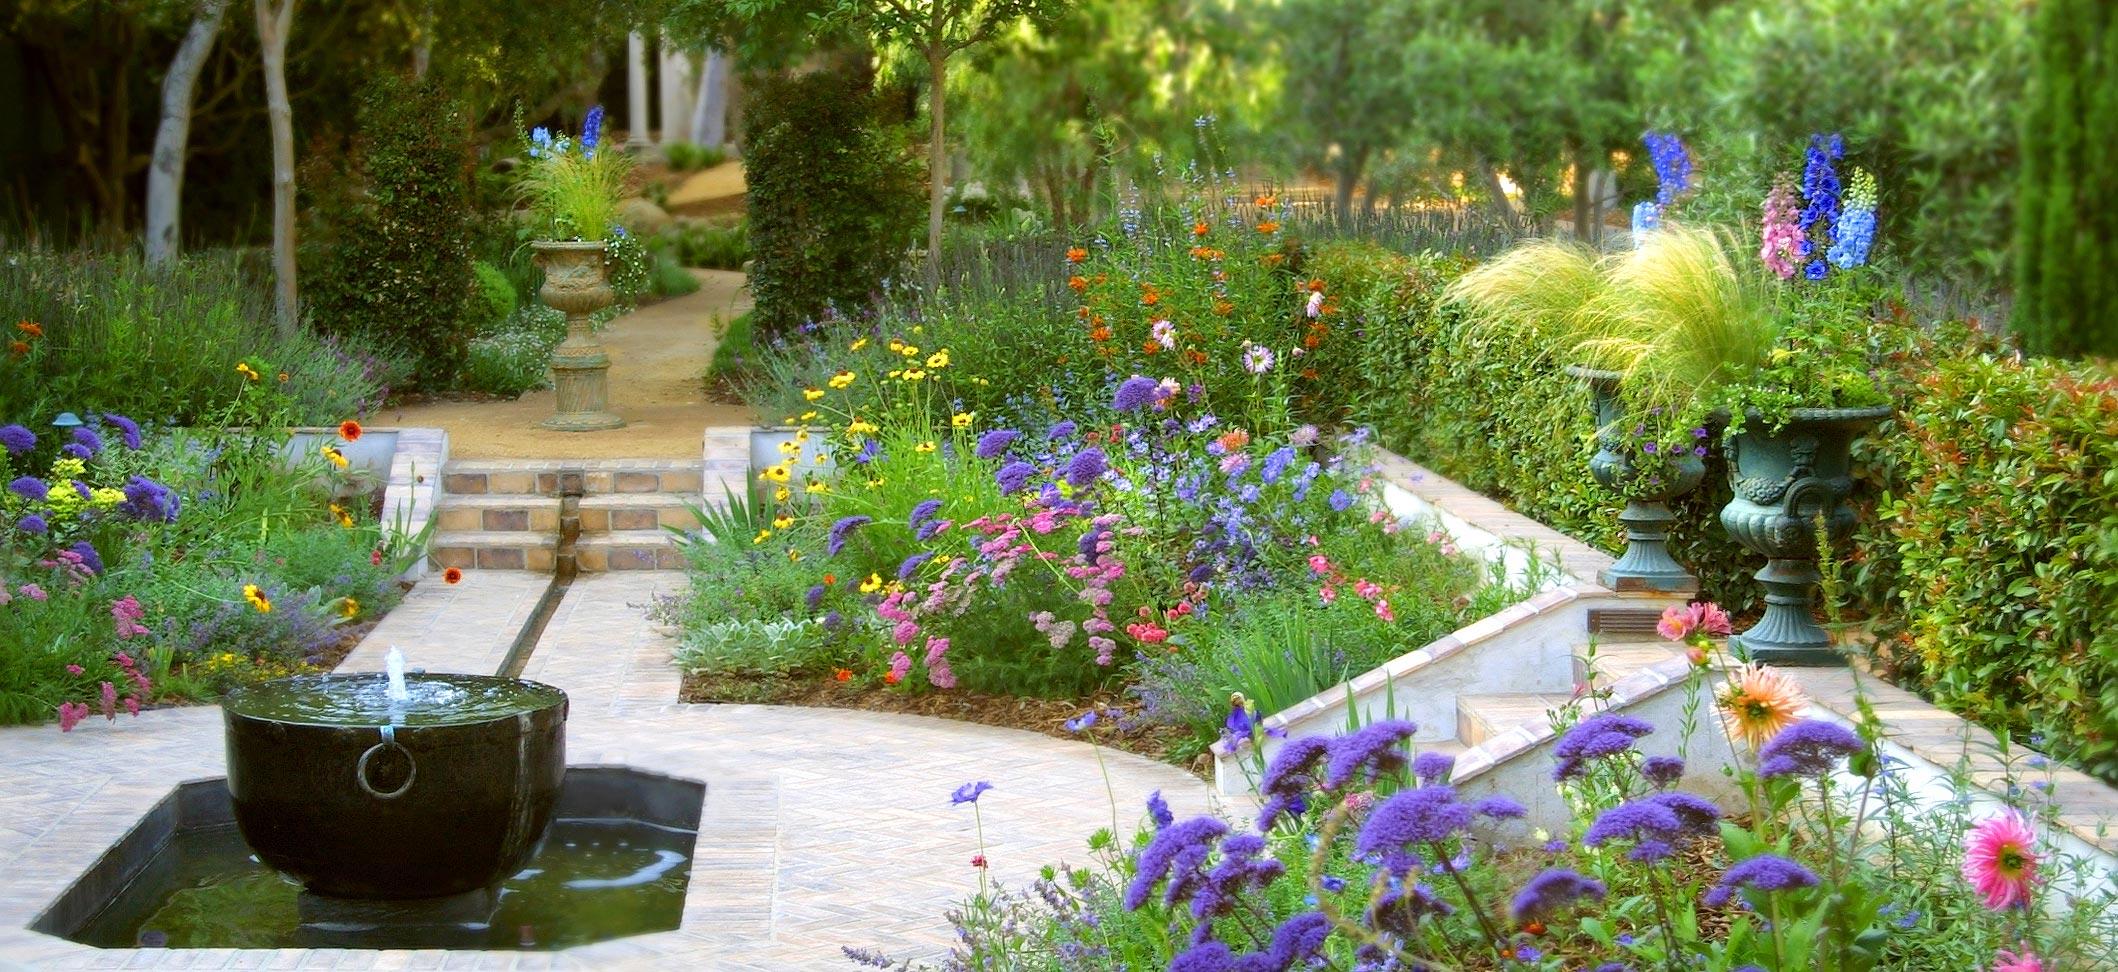 2-sunken-garden-fountain.jpg